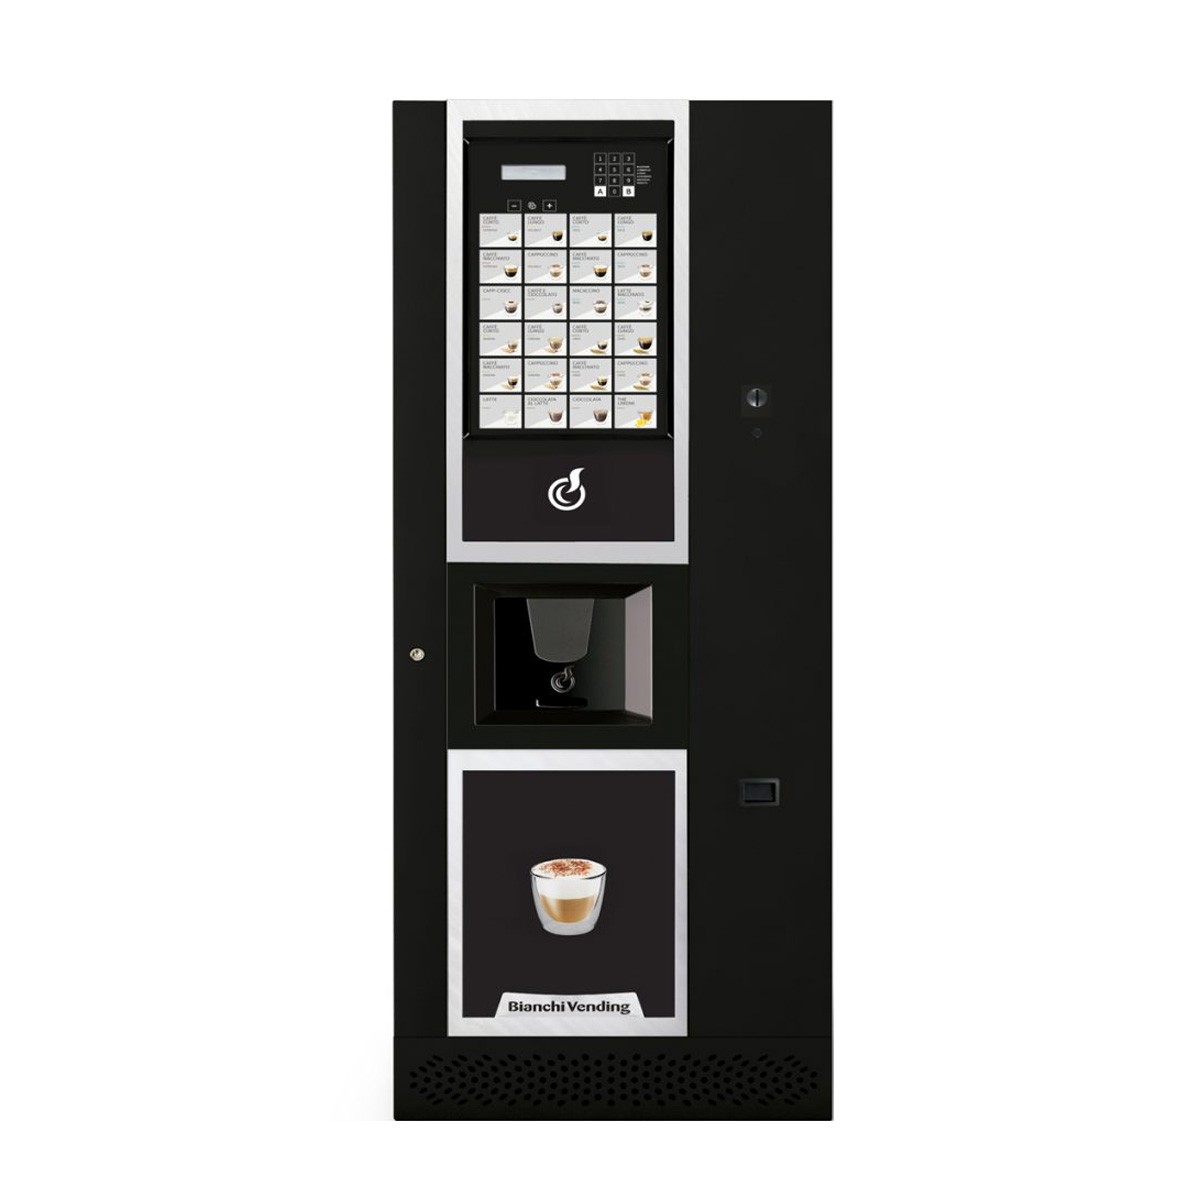 Máquina Automática Vending de Bebidas Quentes LEI 600 EASY Bianchi